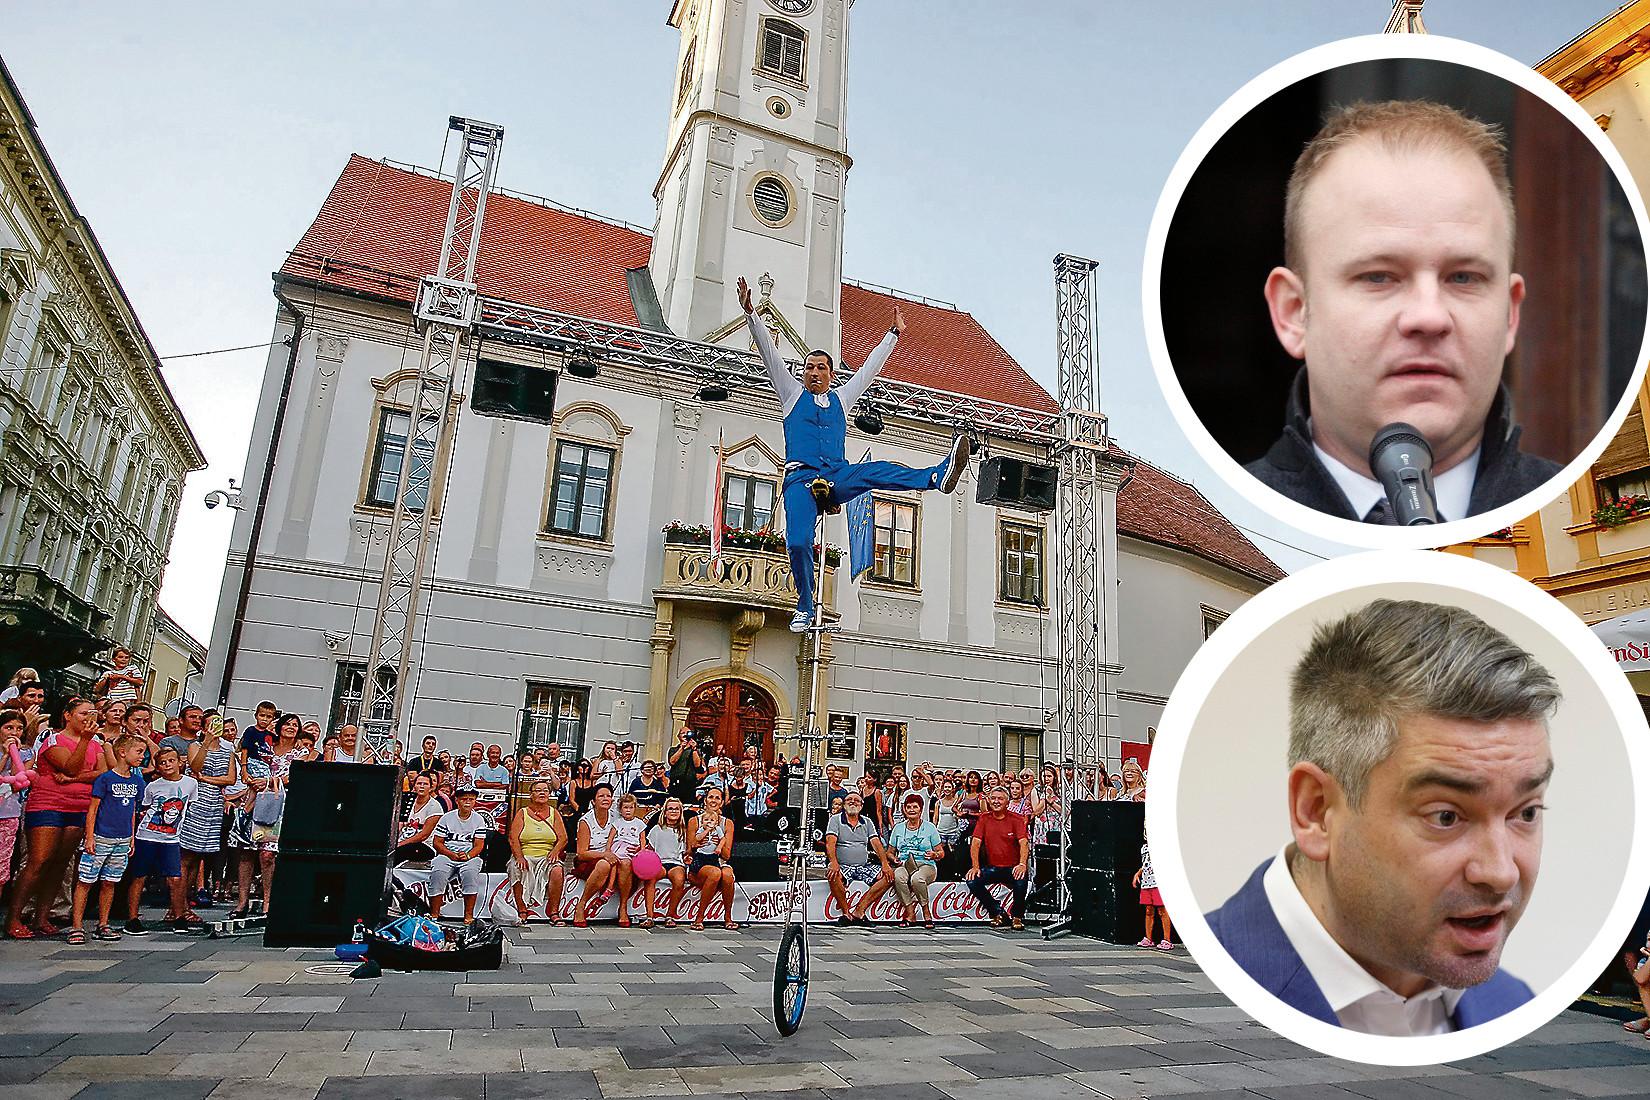 Ilustracija,gradonačelnik Koprivnice Mišel Jakšić,gradonačelnik Pule Boris Miletić